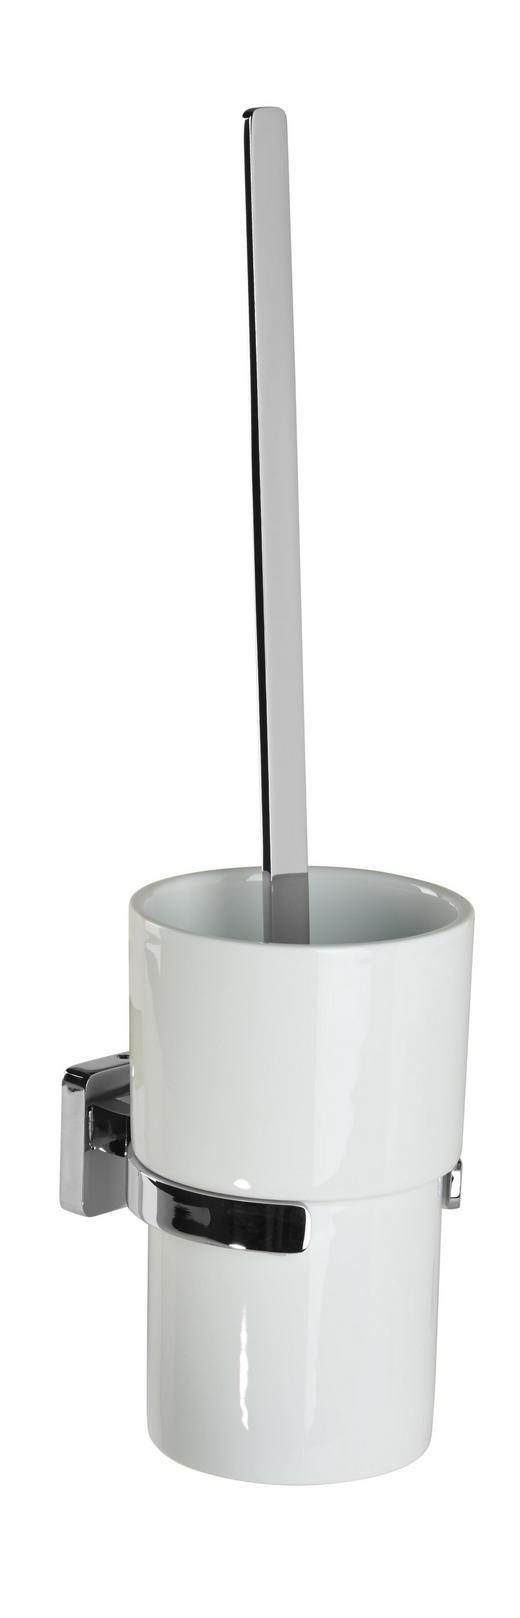 WC-BÜRSTENGARNITUR - Chromfarben/Weiß, Basics, Keramik/Kunststoff (11/39,40cm)